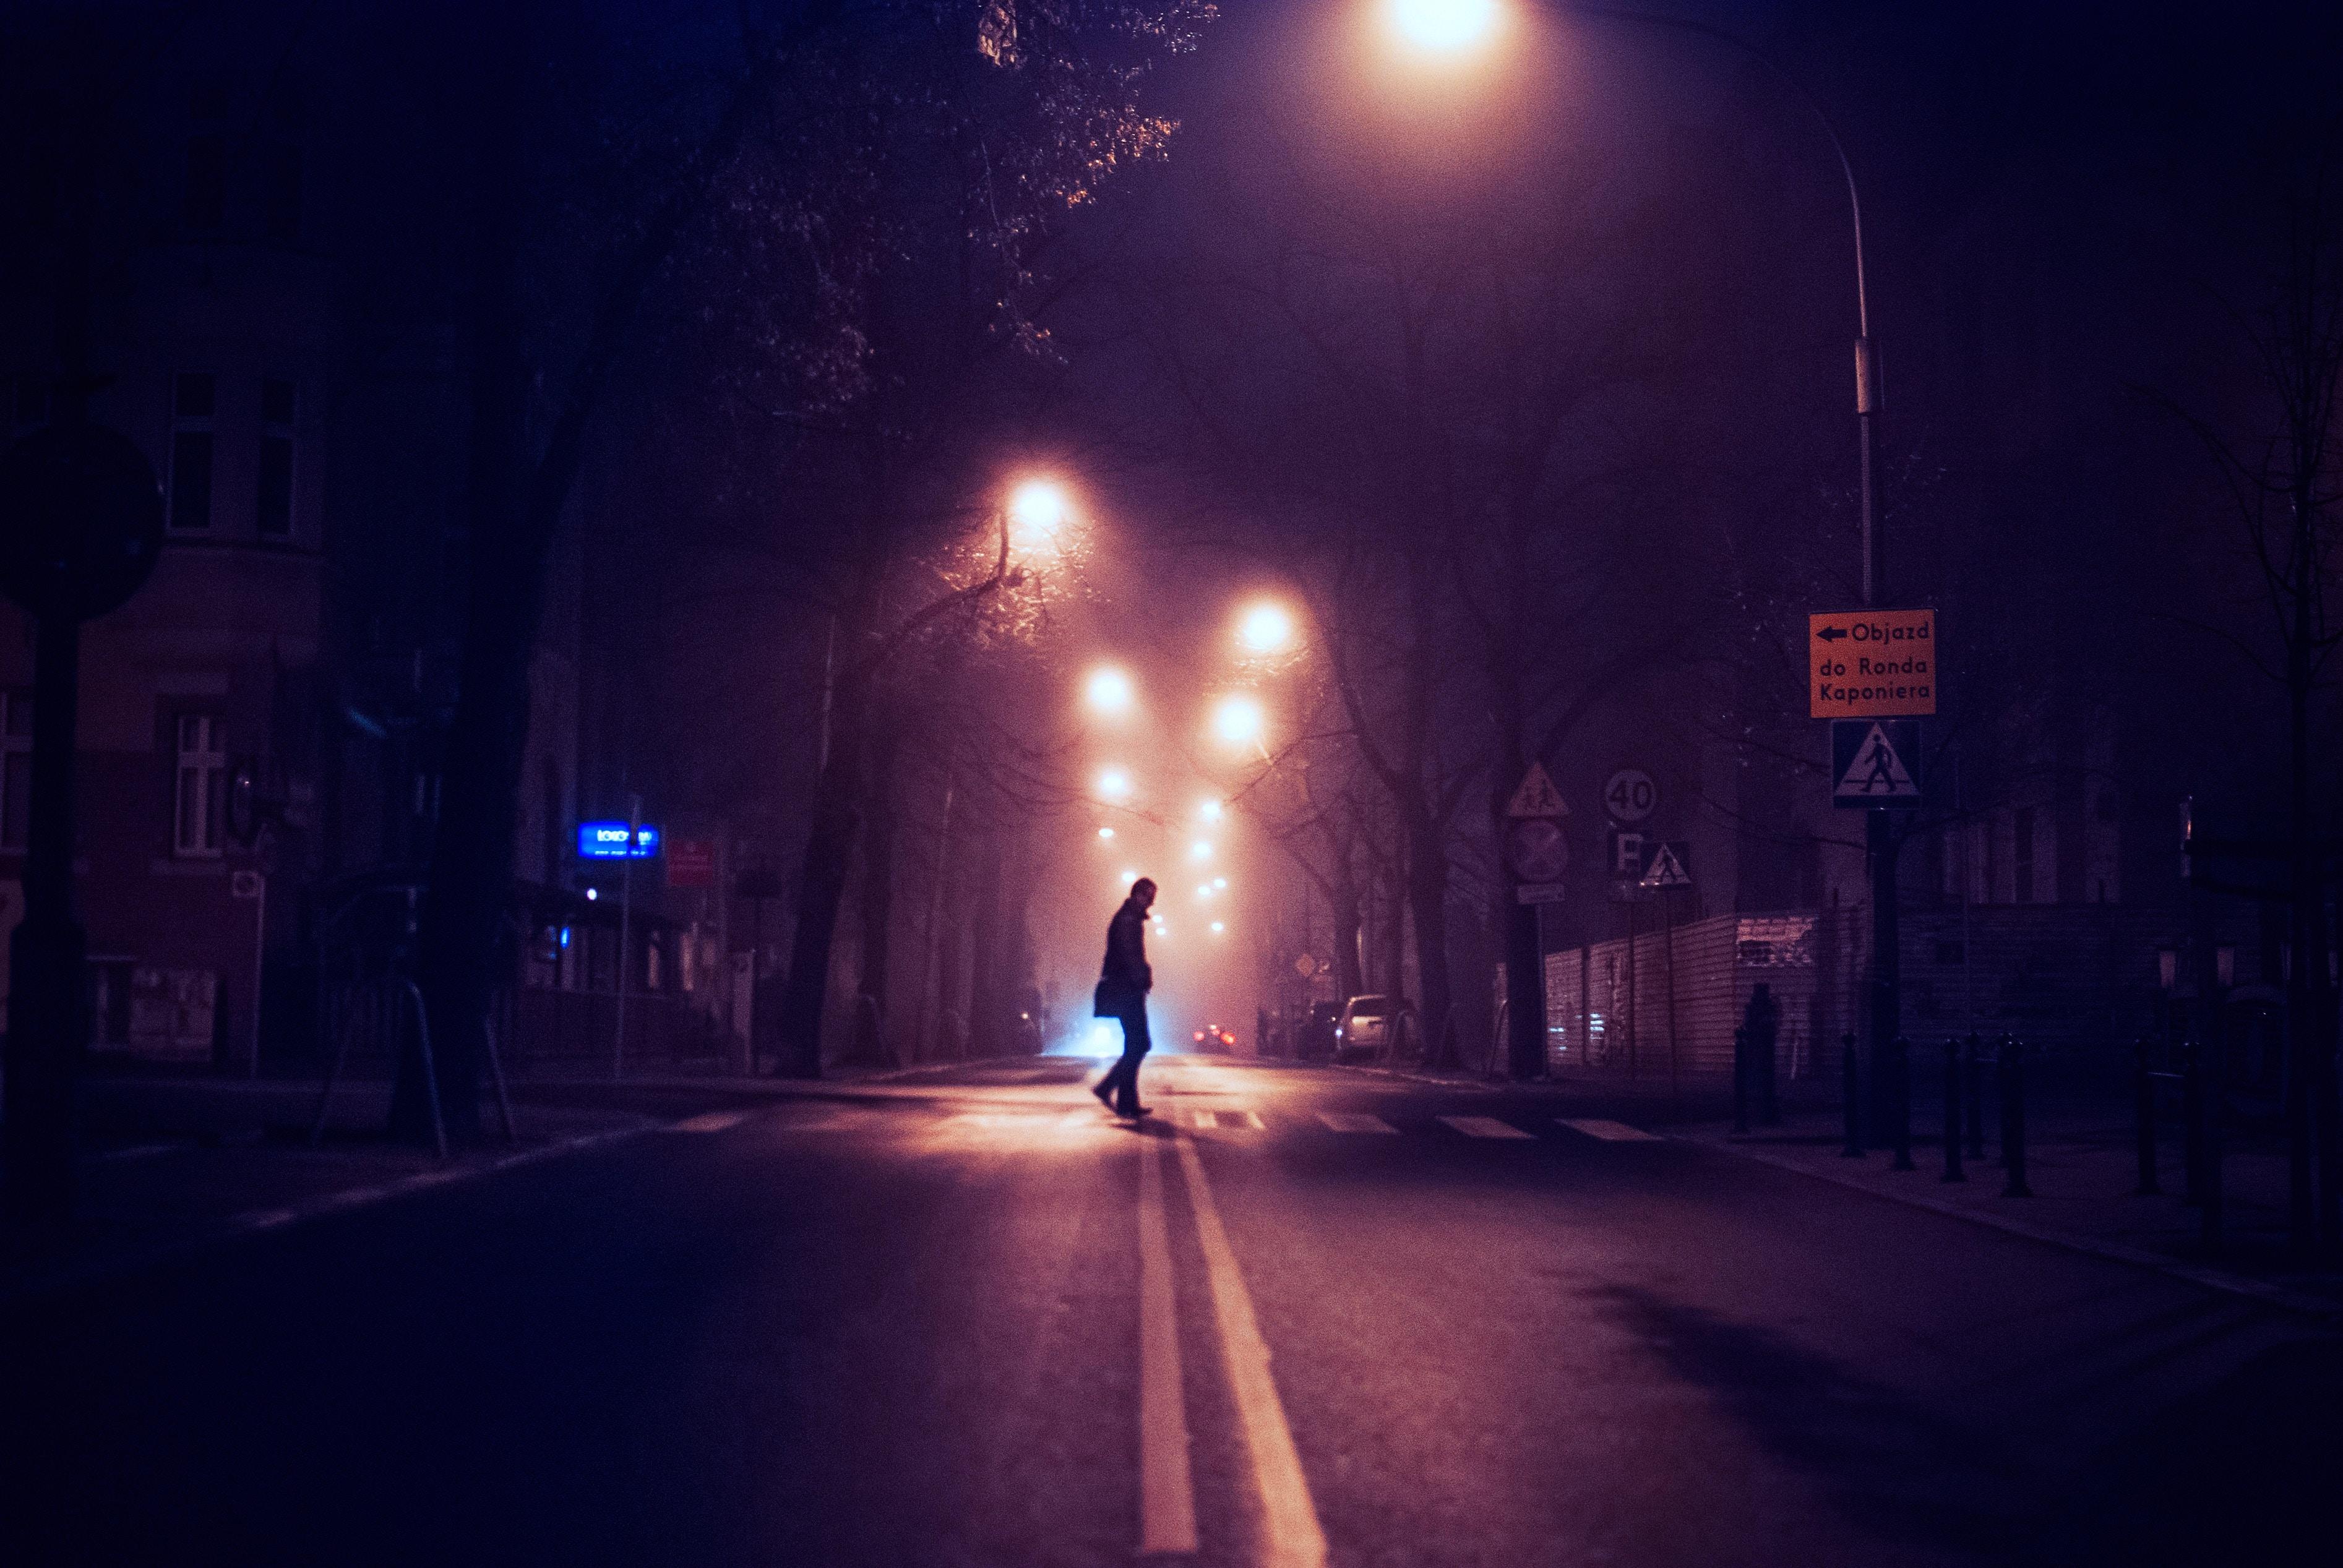 person standing on center asphalt road